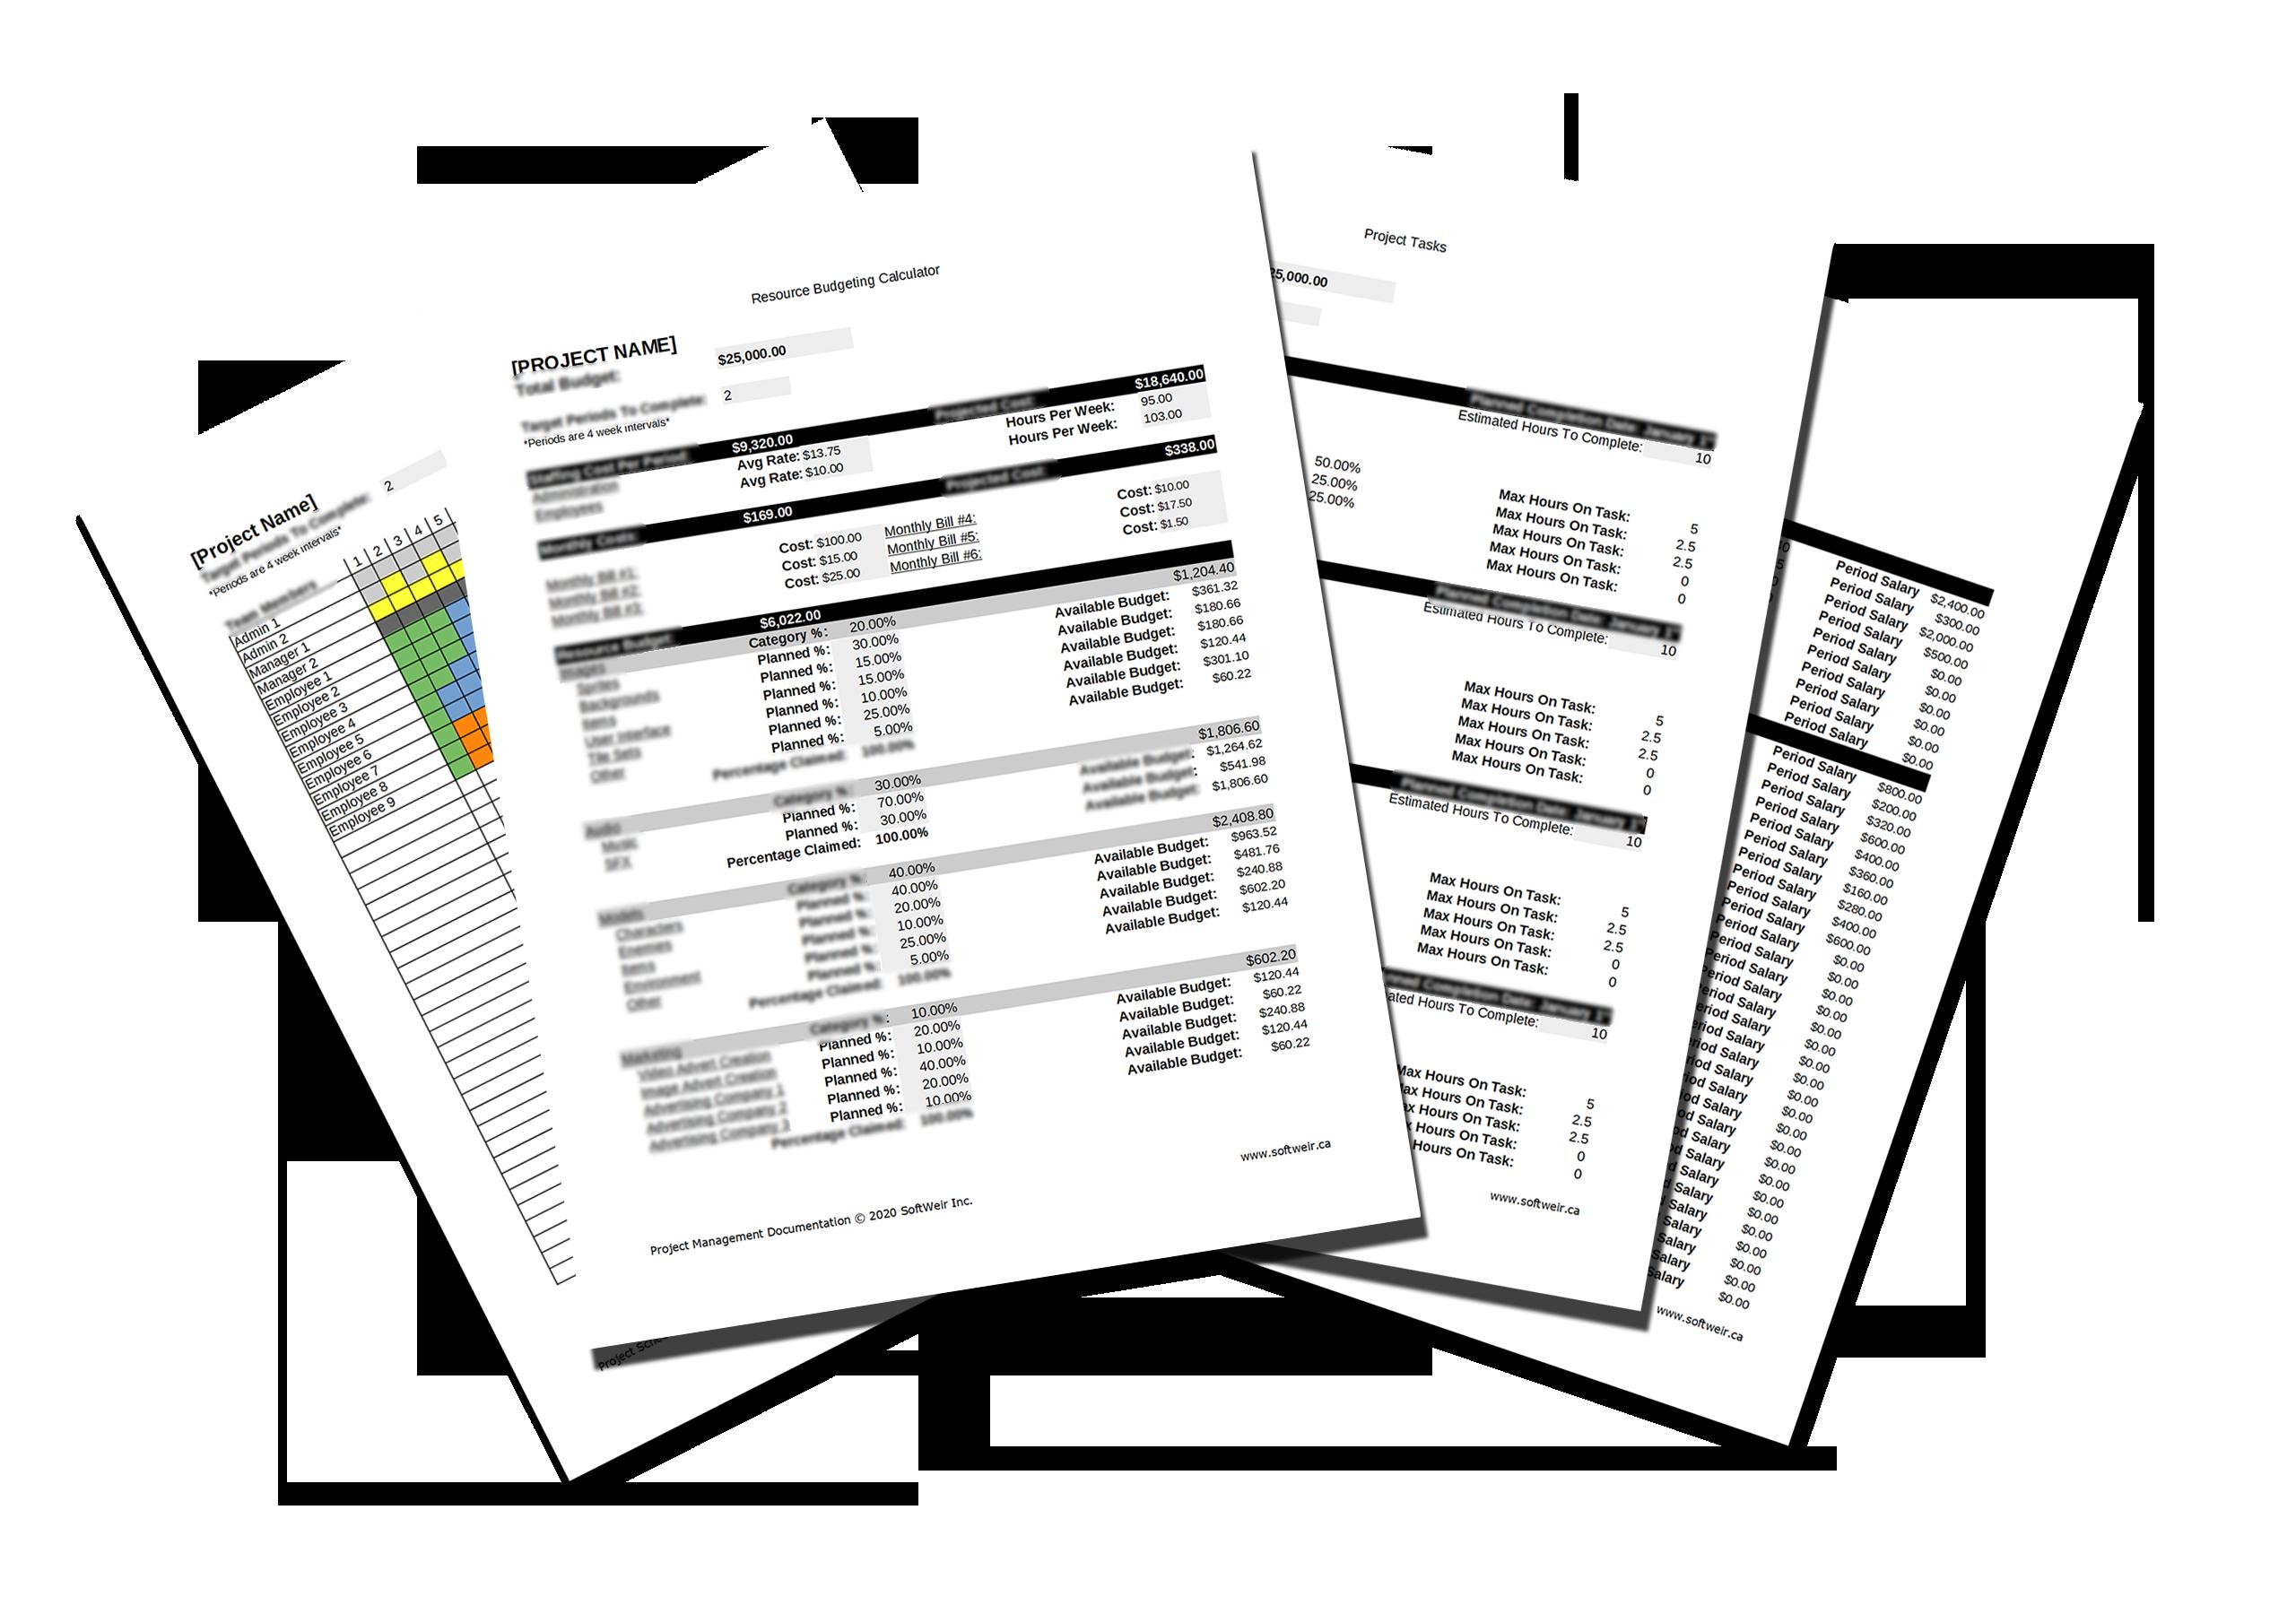 Project Management Documentation   SoftWeir Inc.